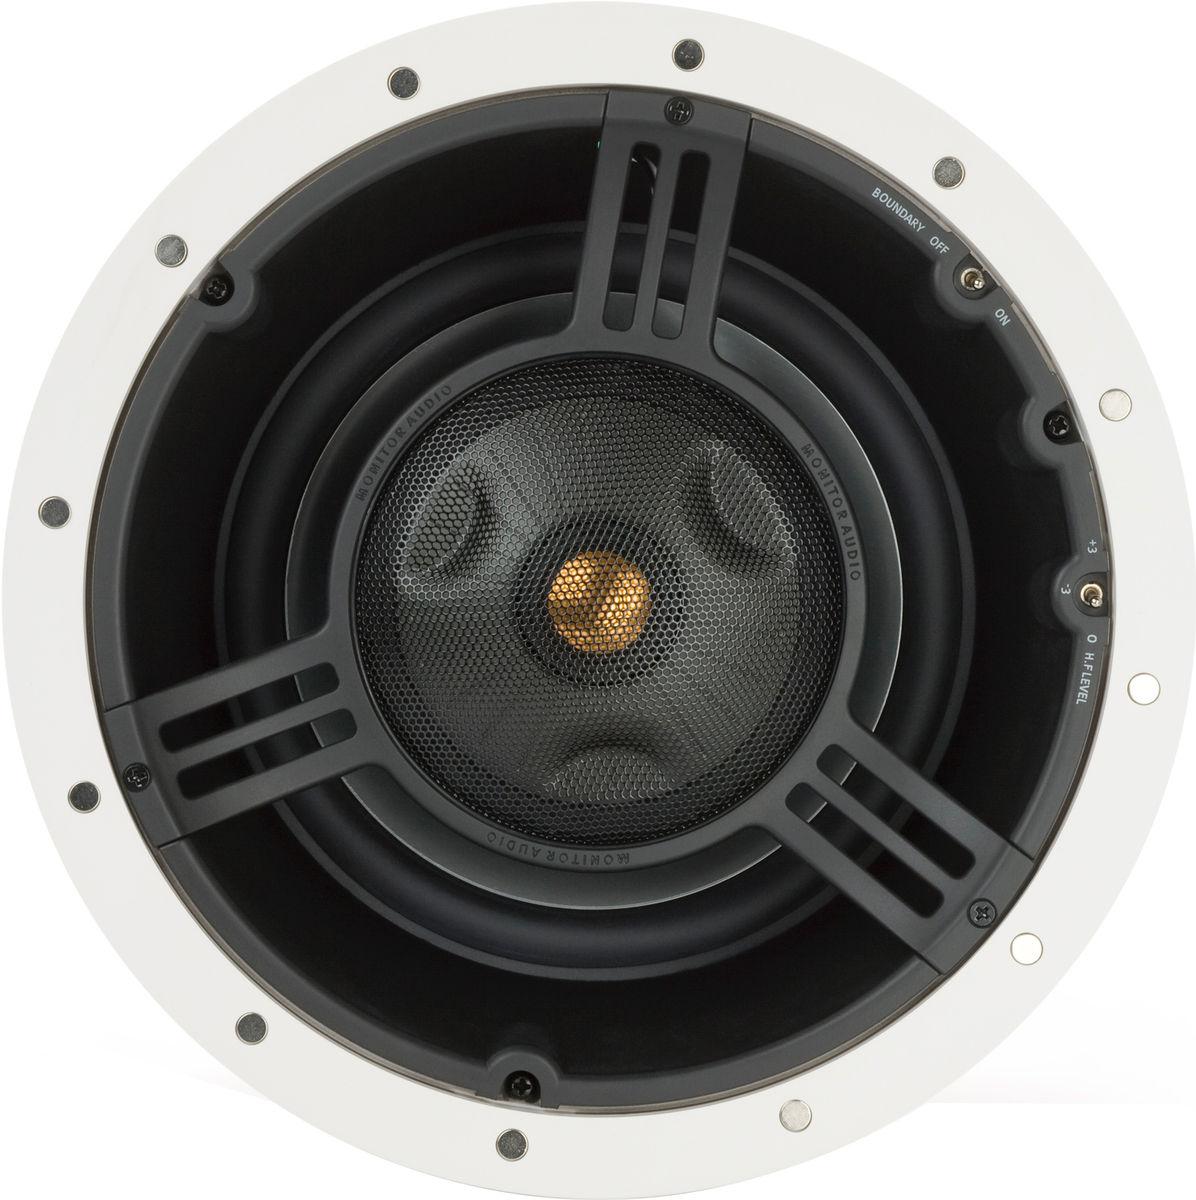 monitor audio ct280 idc enceintes son vid. Black Bedroom Furniture Sets. Home Design Ideas